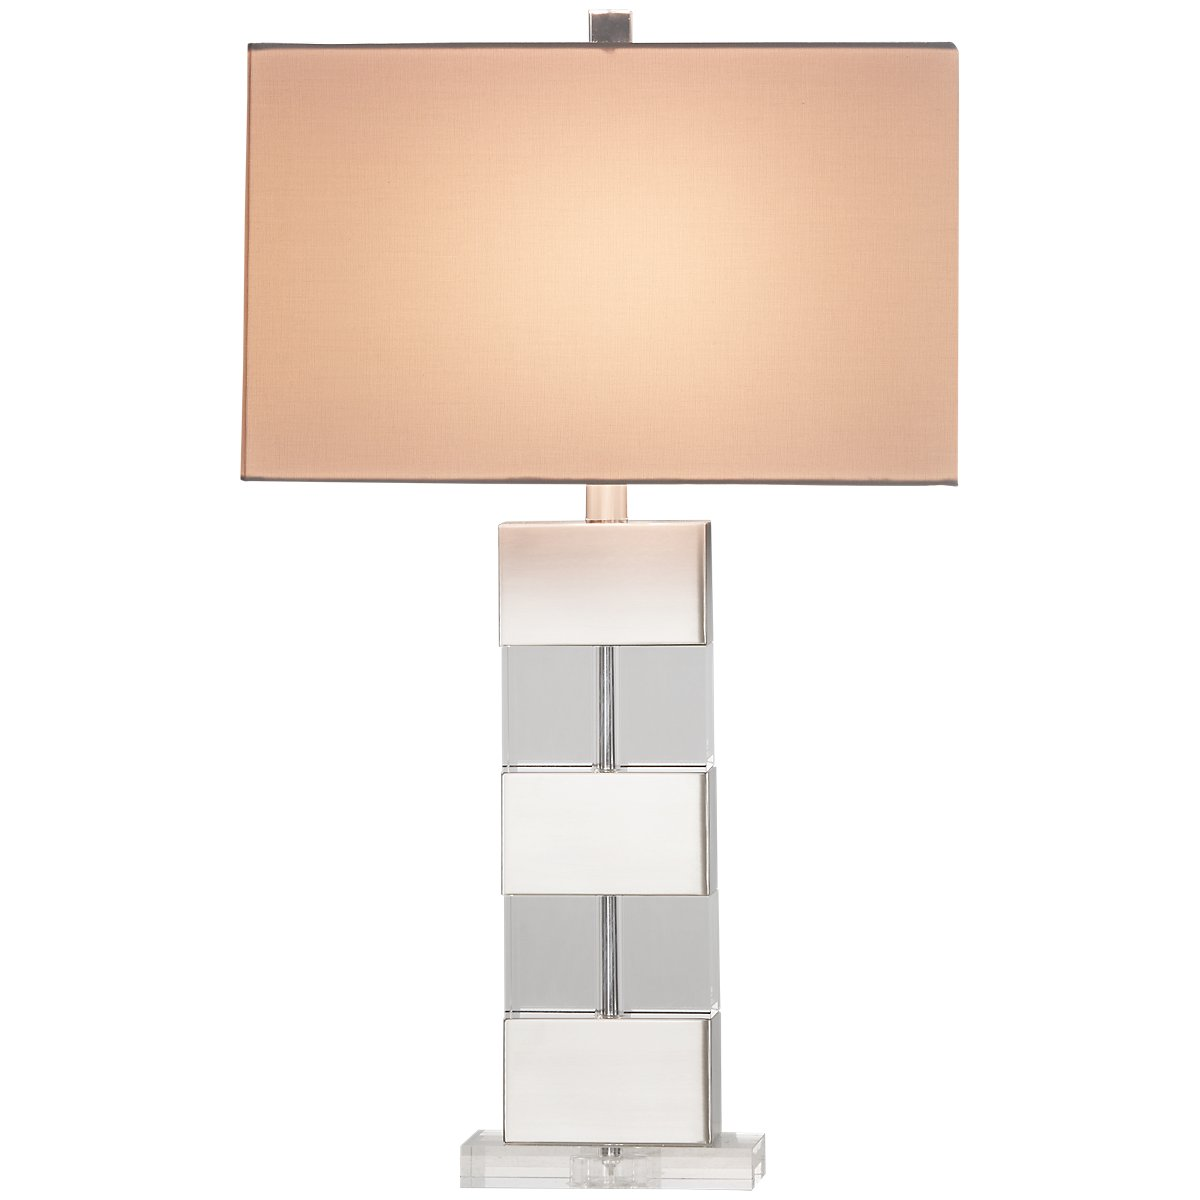 City furniture elara silver table lamp elara silver table lamp view larger geotapseo Image collections